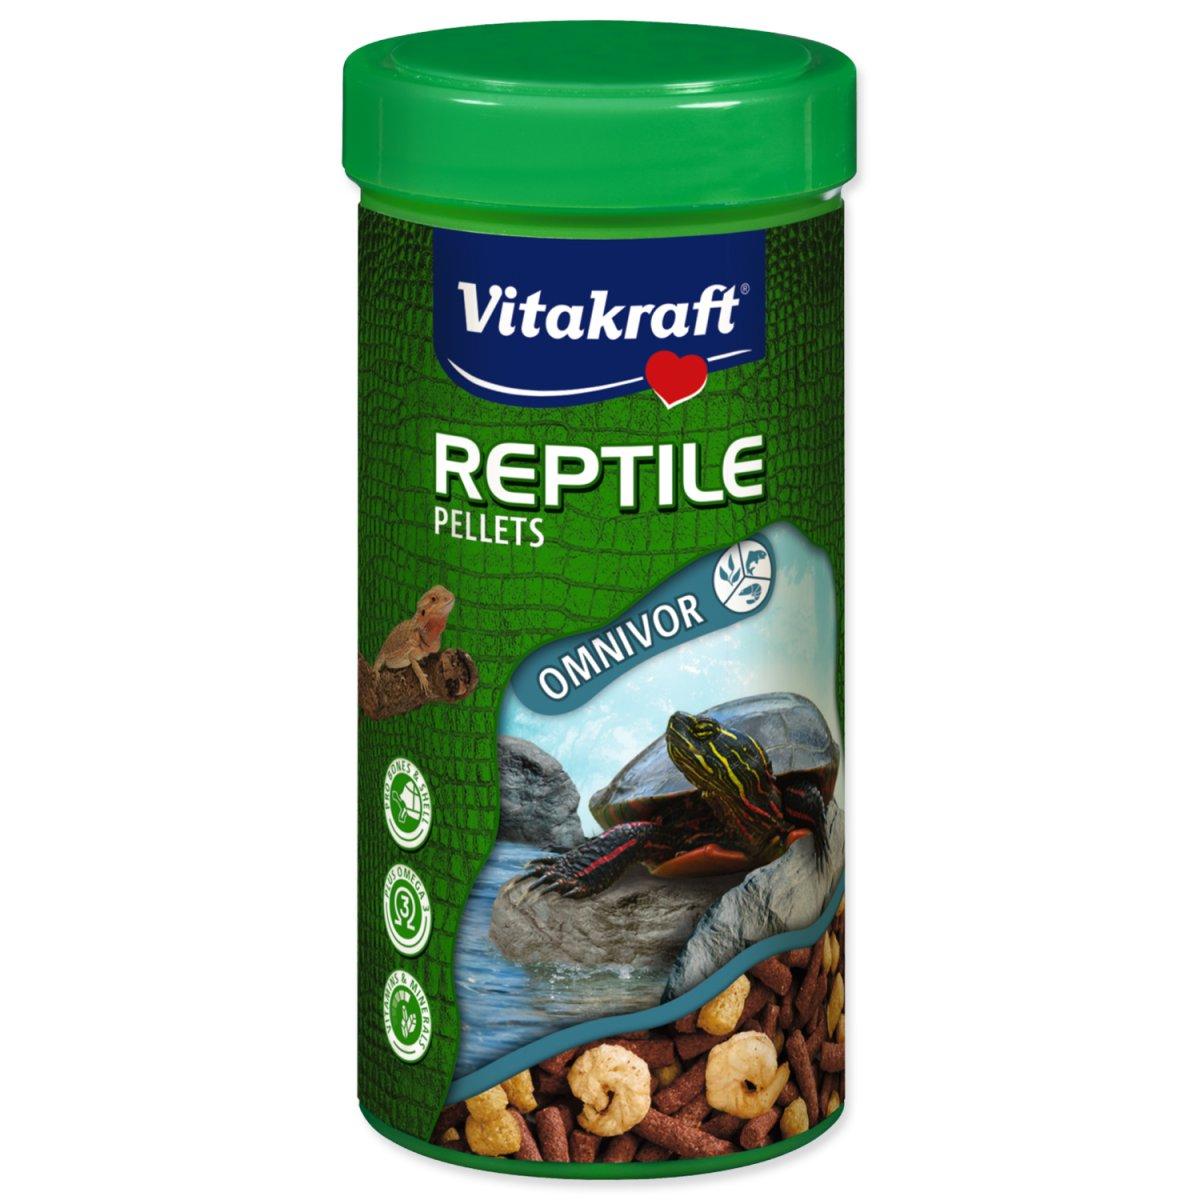 VITAKRAFT Reptile Pellets (250ml)